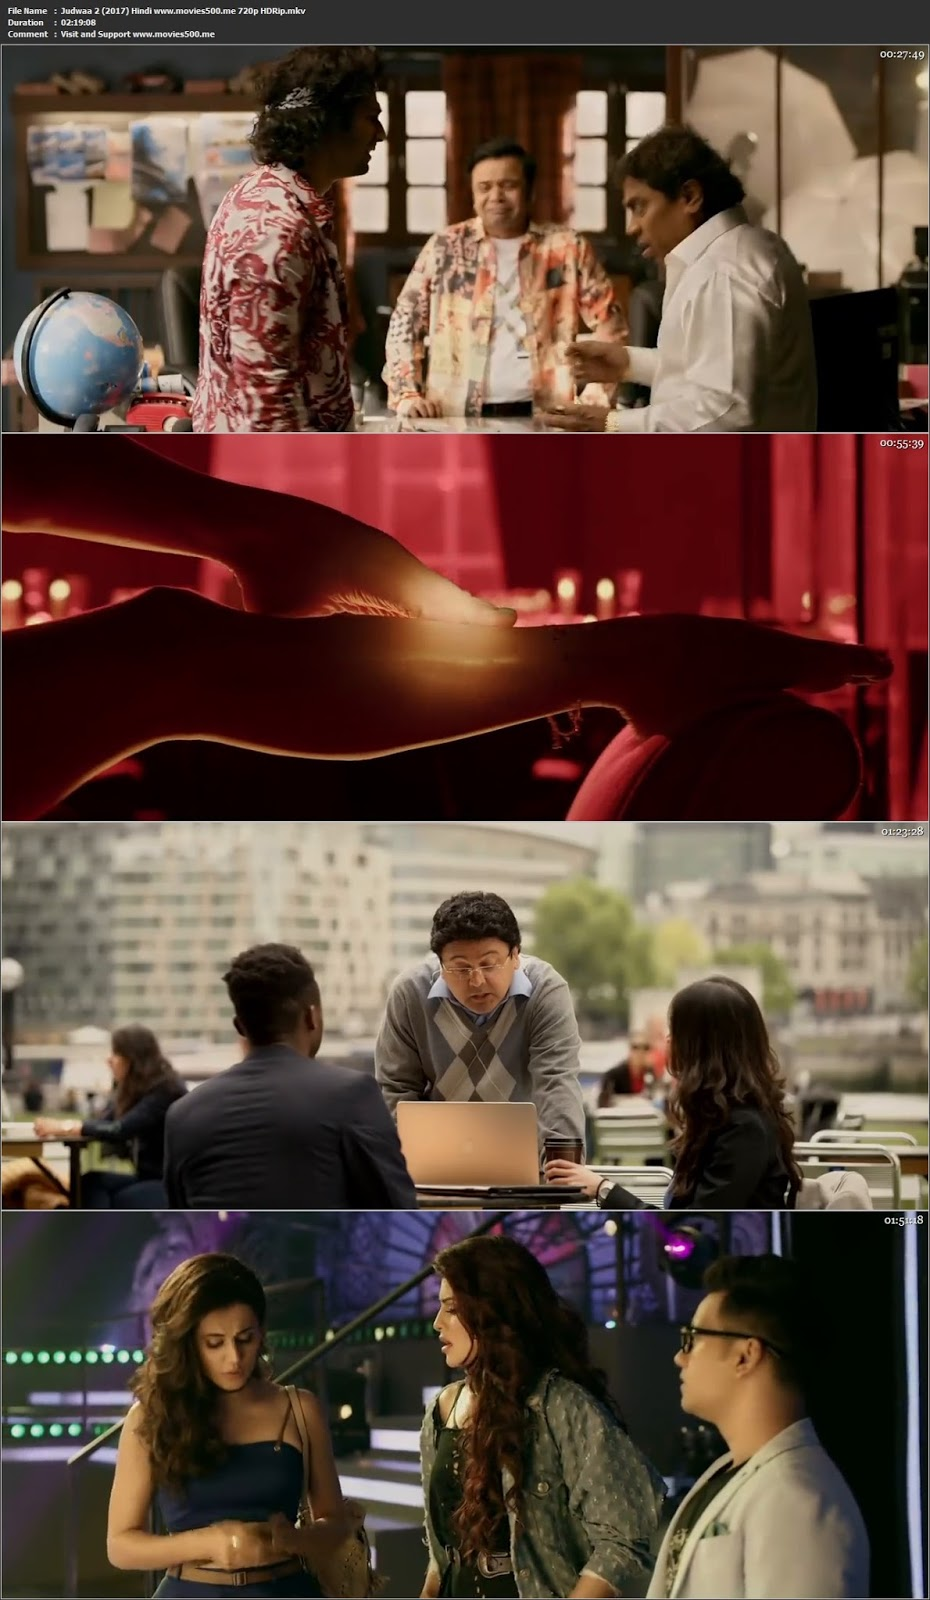 Judwaa 2 2017 Hindi Full Movie HDRip 720p 1GB at freealcoholtest.com